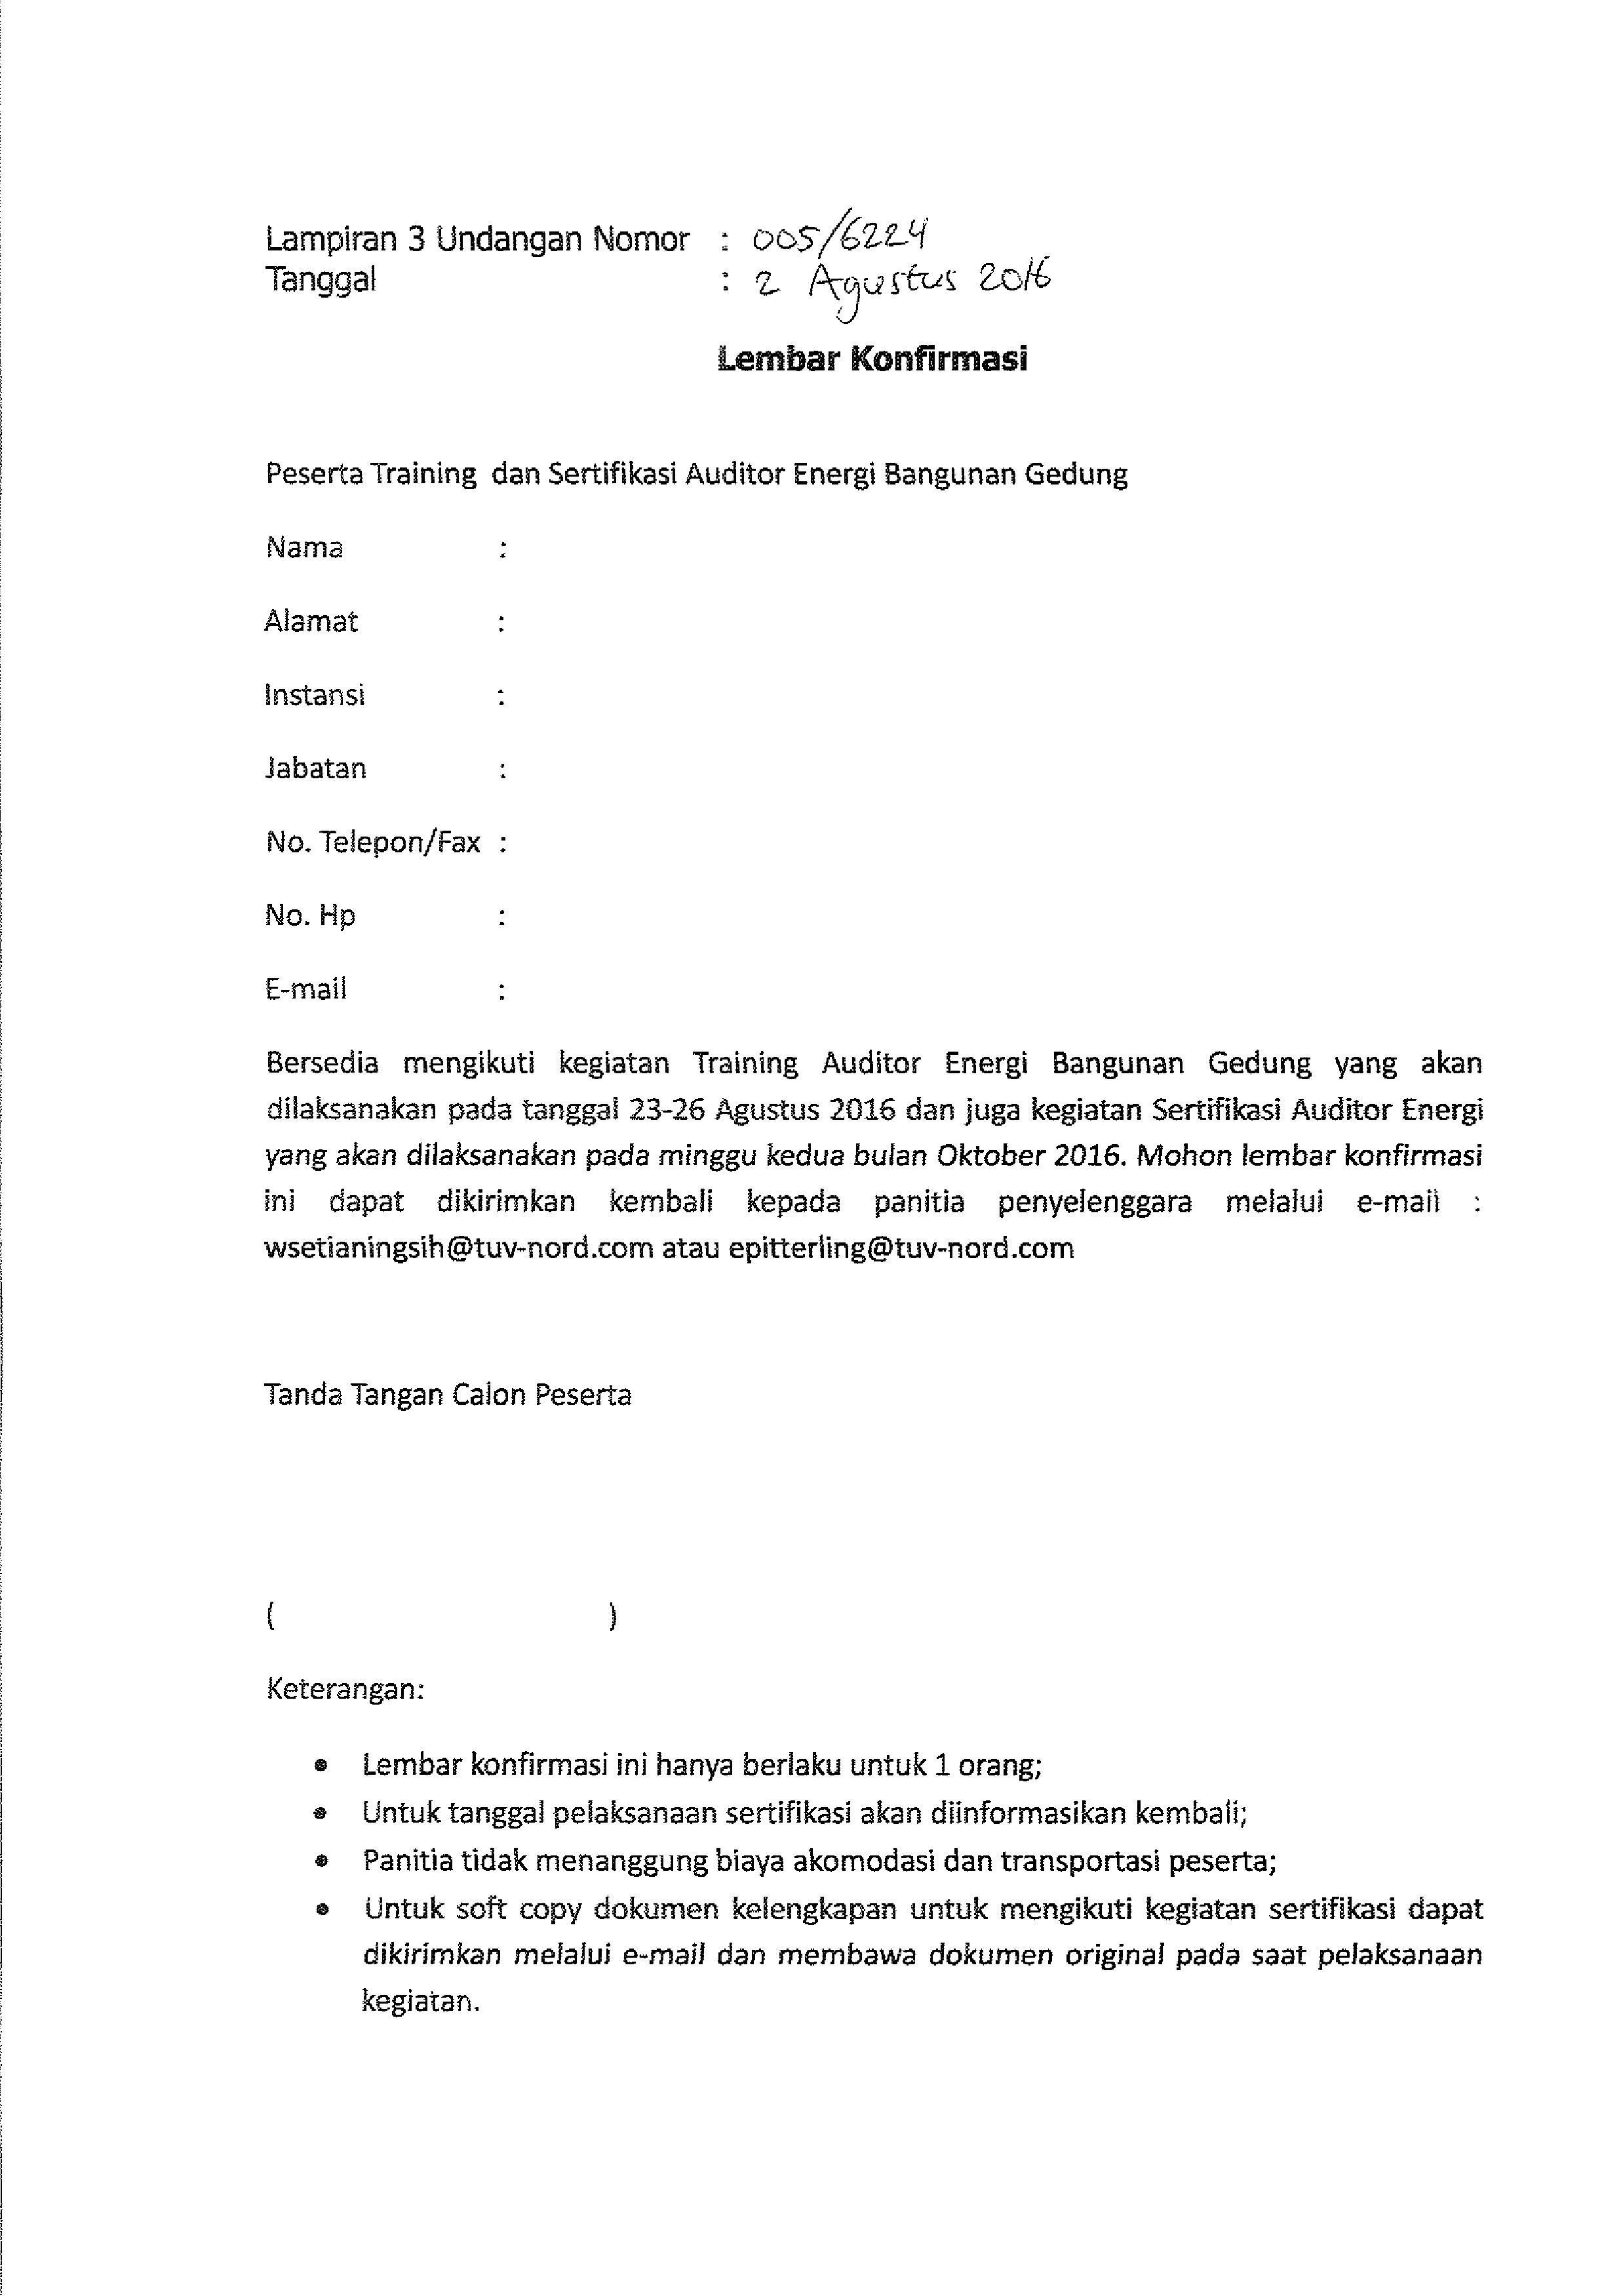 Invitation energy auditor training semarang confirmation letter invitation energy auditor training semarang confirmation letter stopboris Image collections